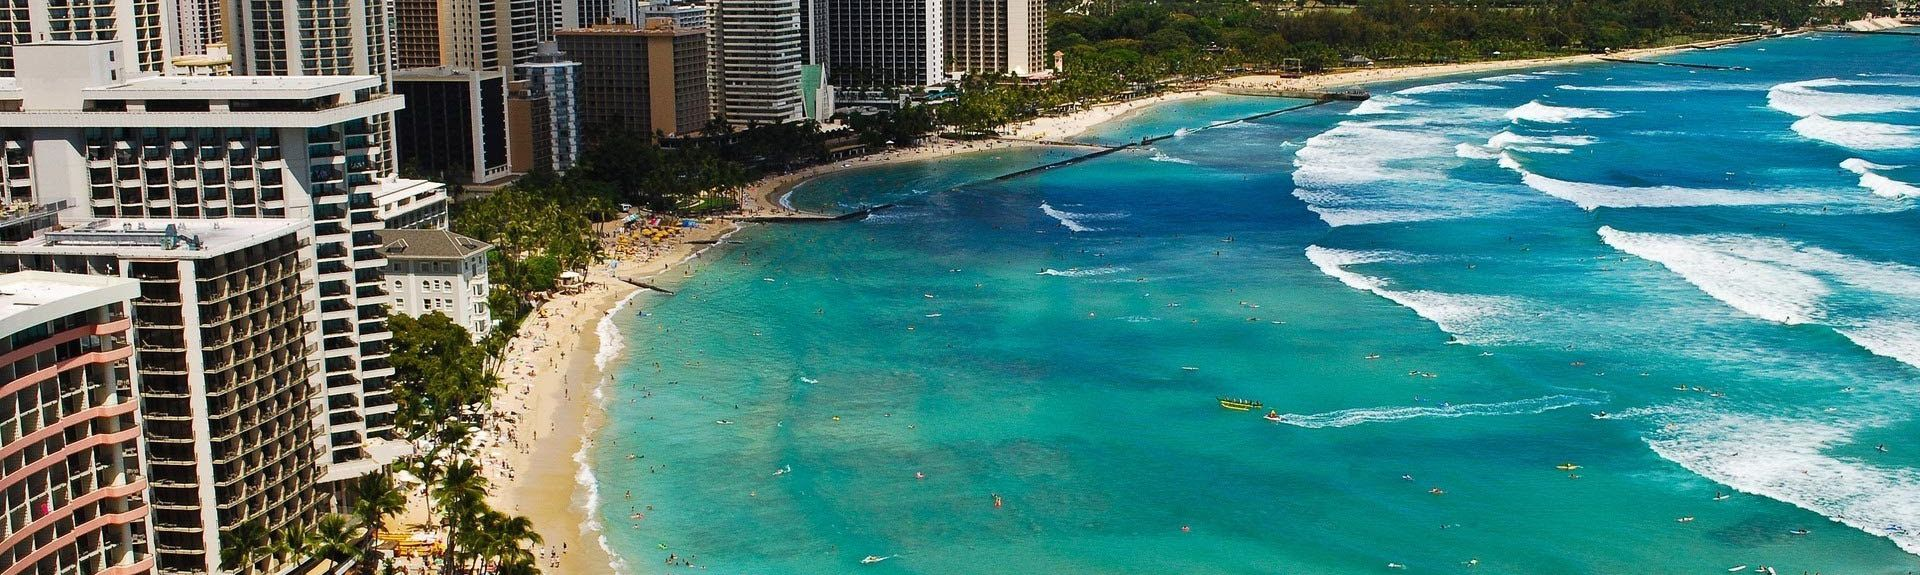 Liliha – Kapalama, Honolulu, Hawaii, USA